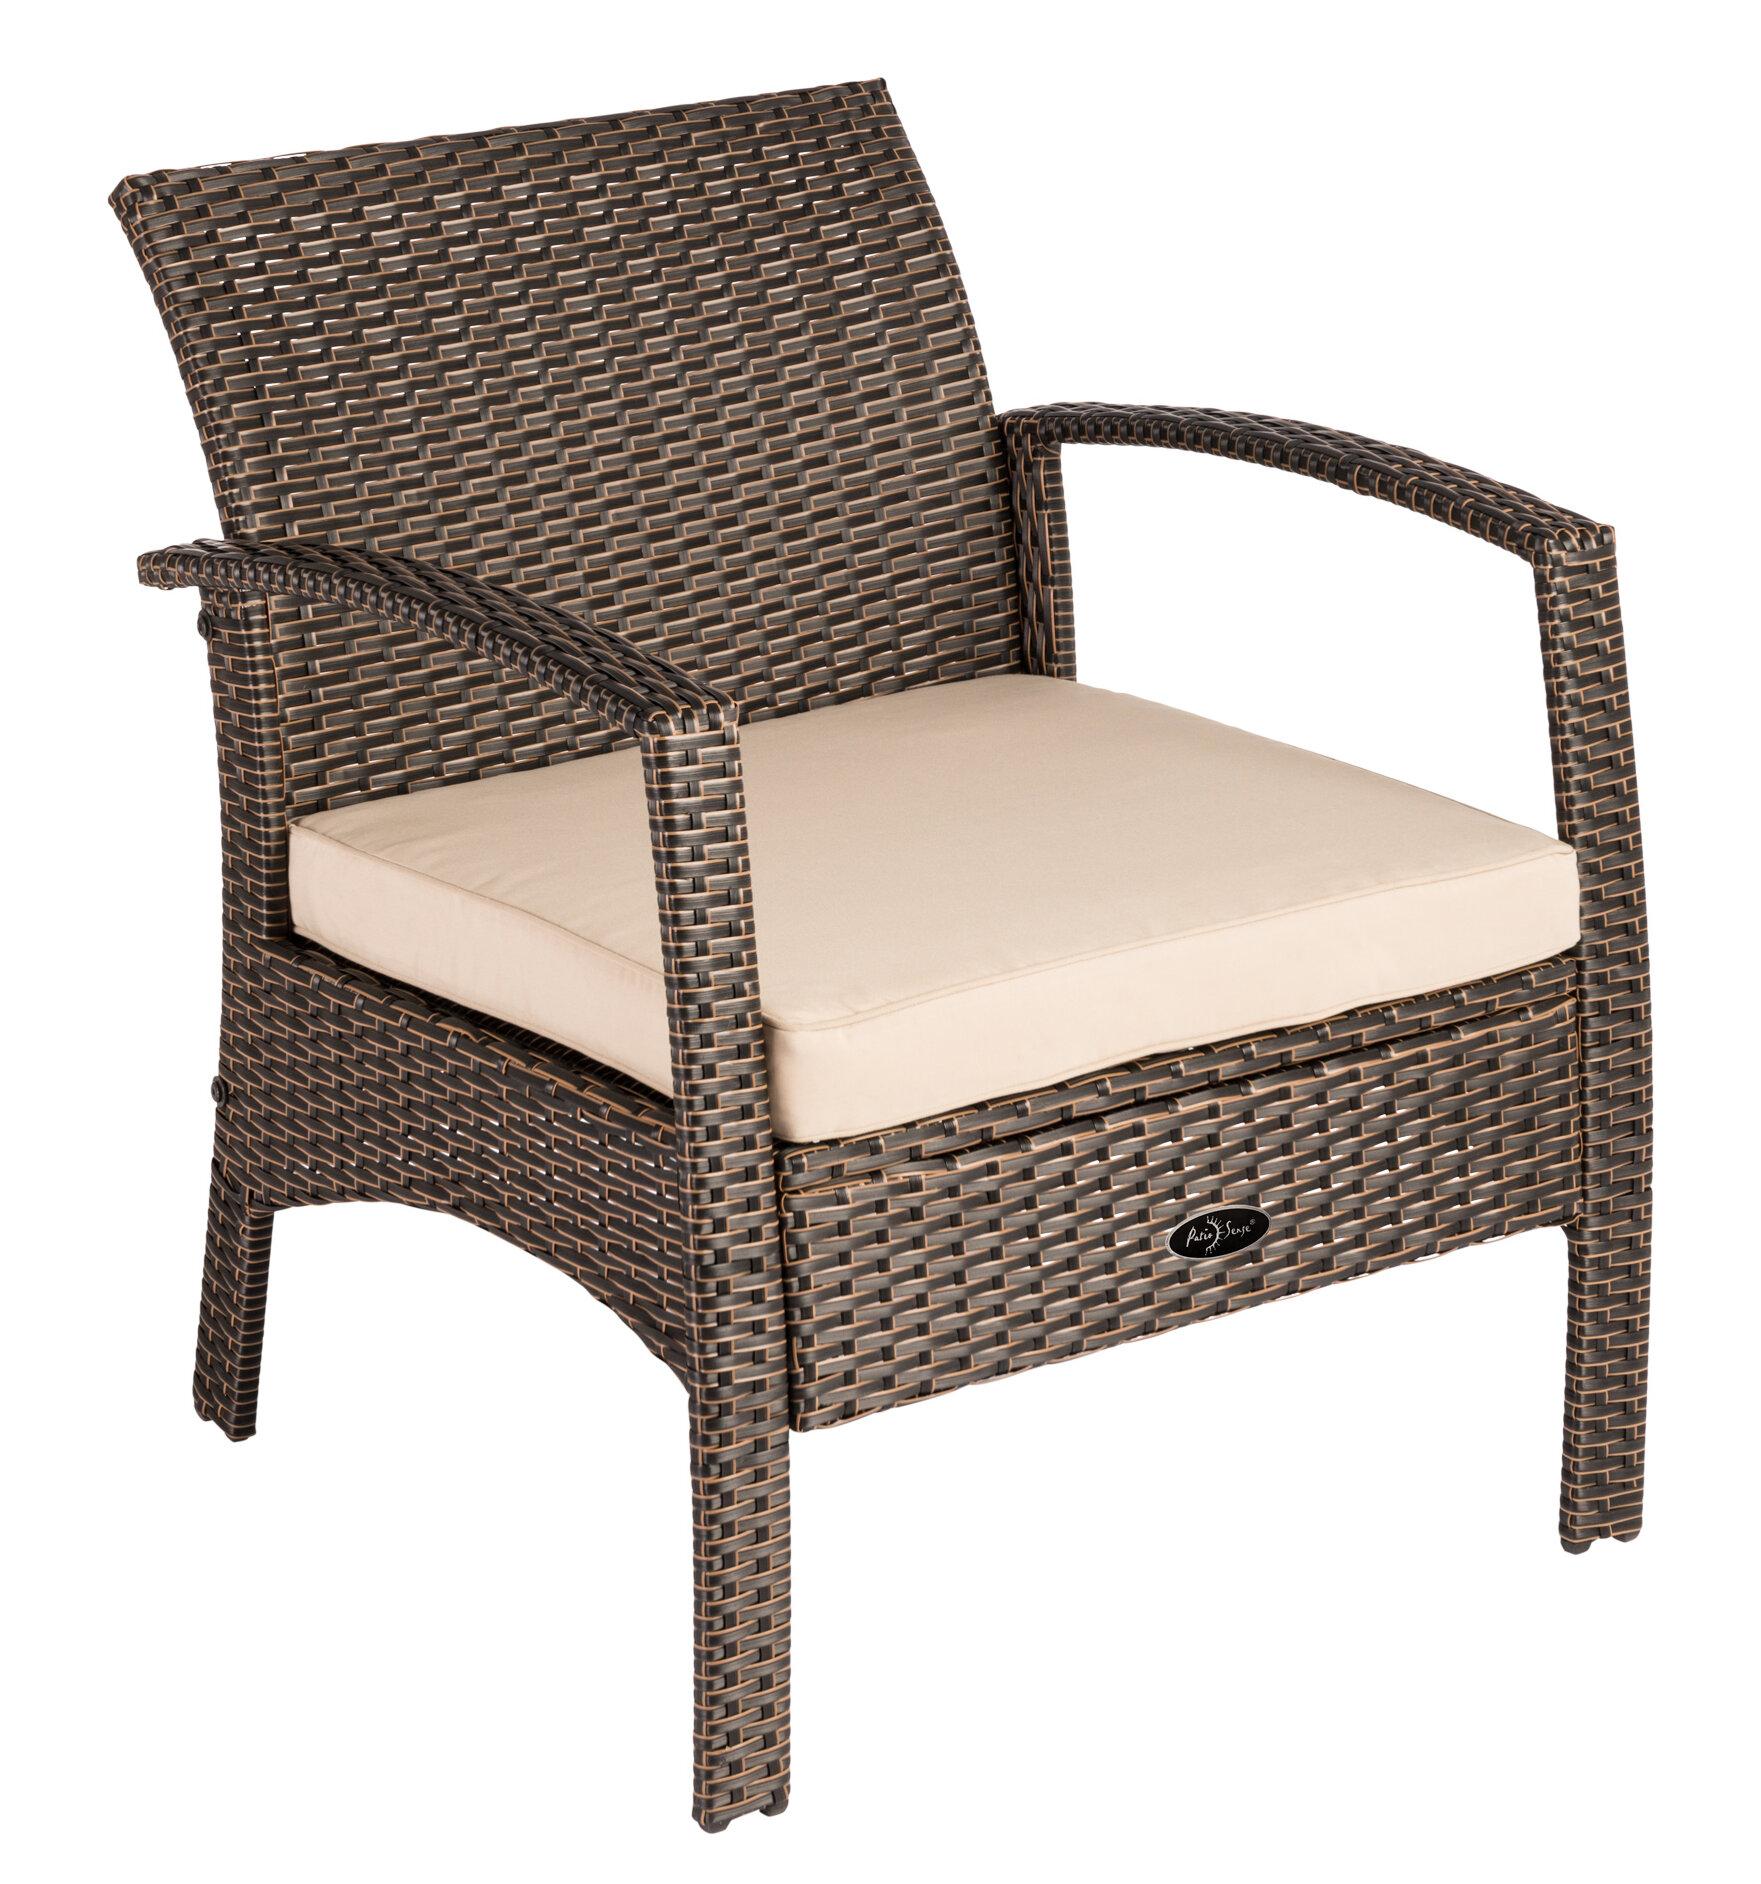 Patiosense Bondi Patio Chair With